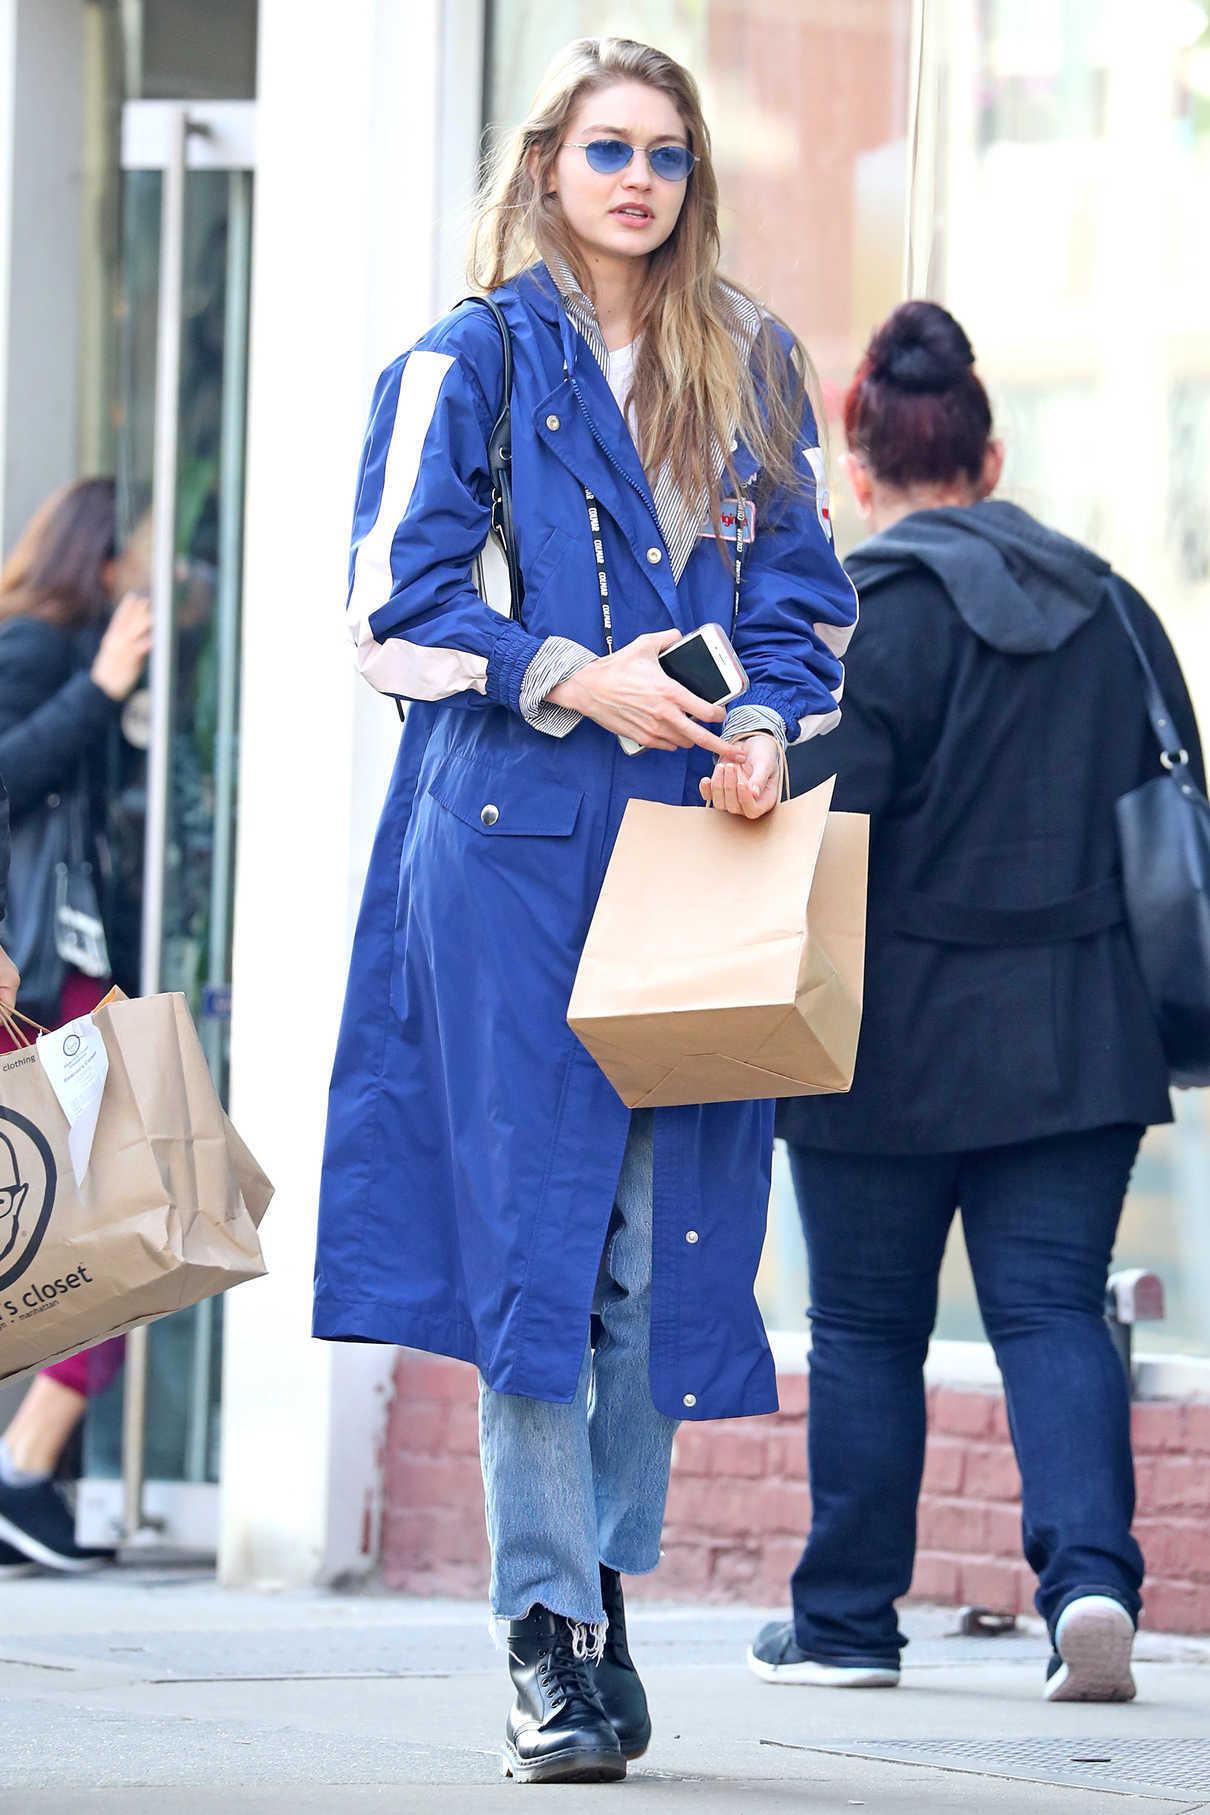 Gigi Hadid in a Blue Trench Coat